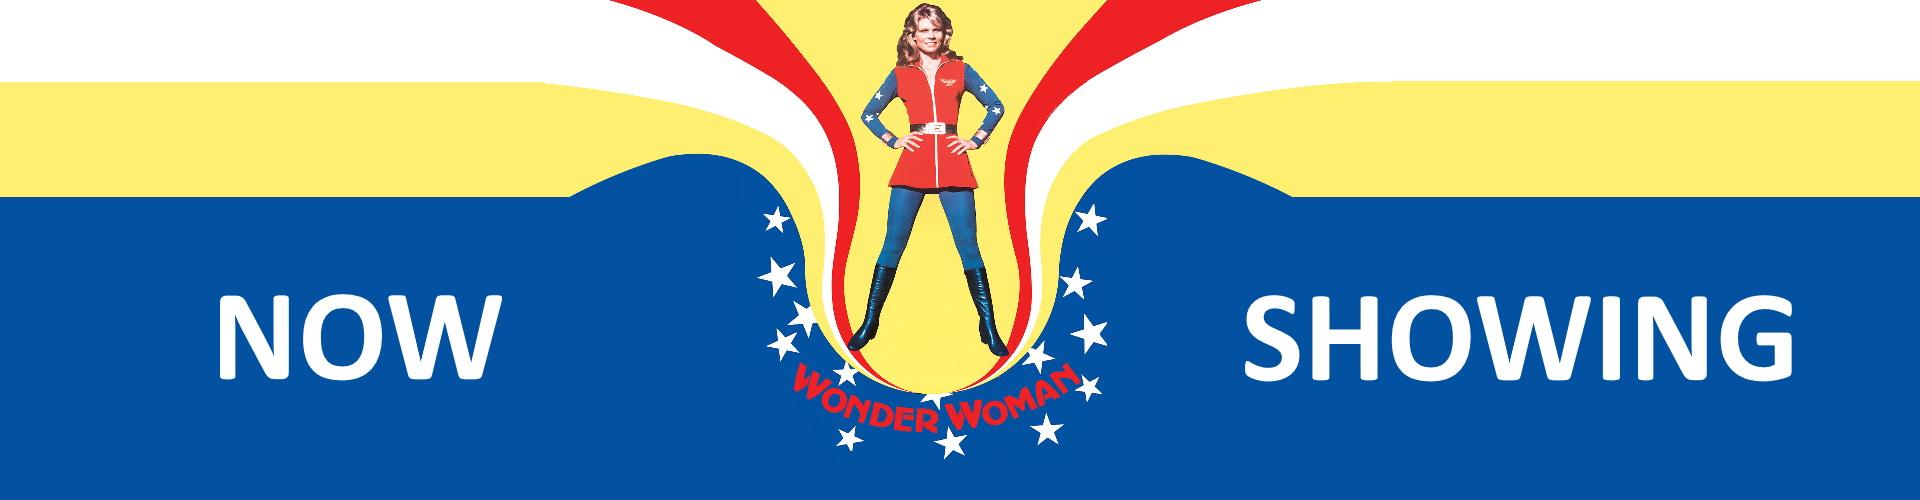 Wonderwoman1974nowshowing